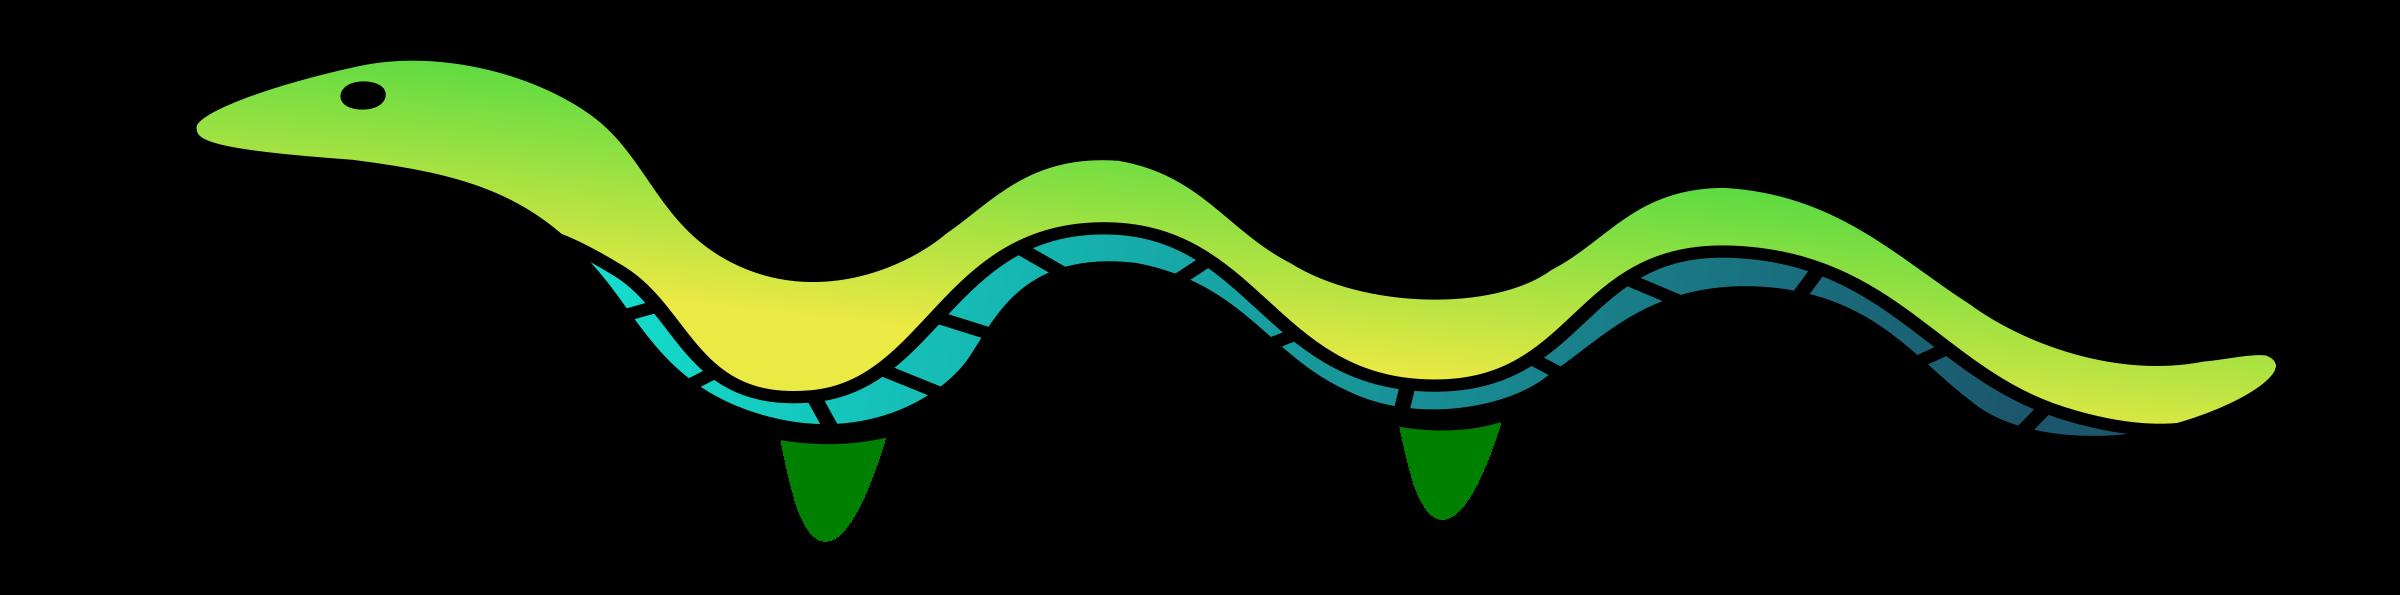 Snake clipart animation. Add feet big image